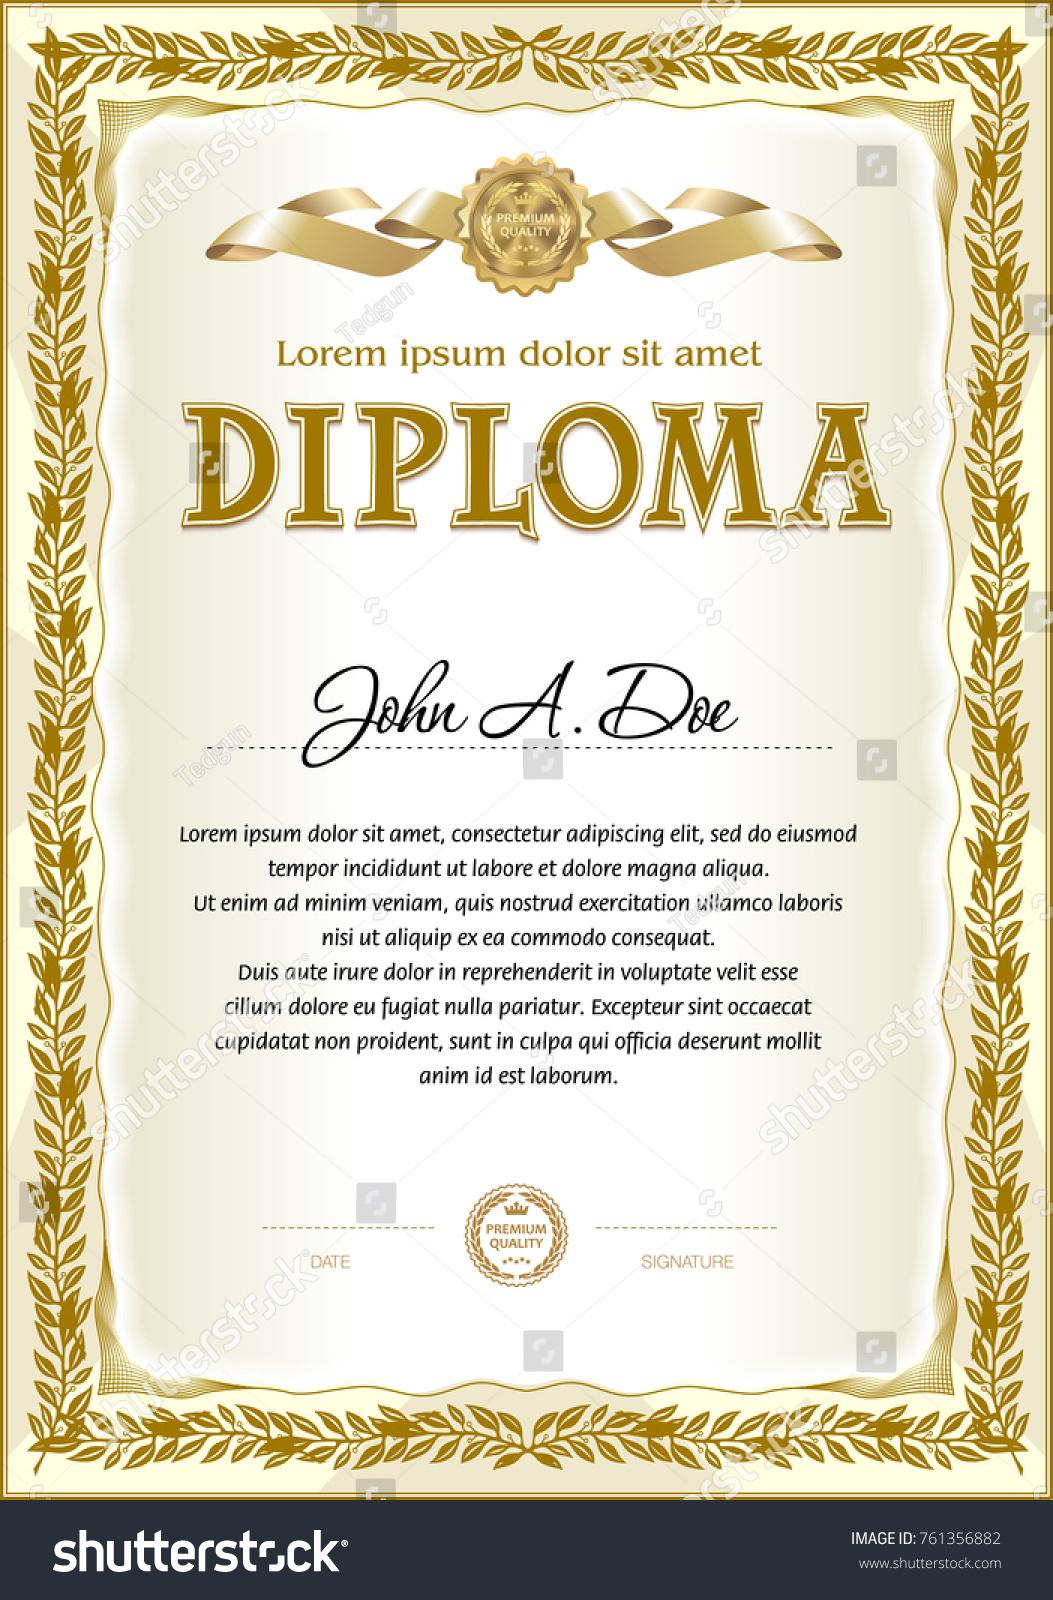 vintage diploma blank template monochrome color stock vector  vintage diploma blank template monochrome color gamma